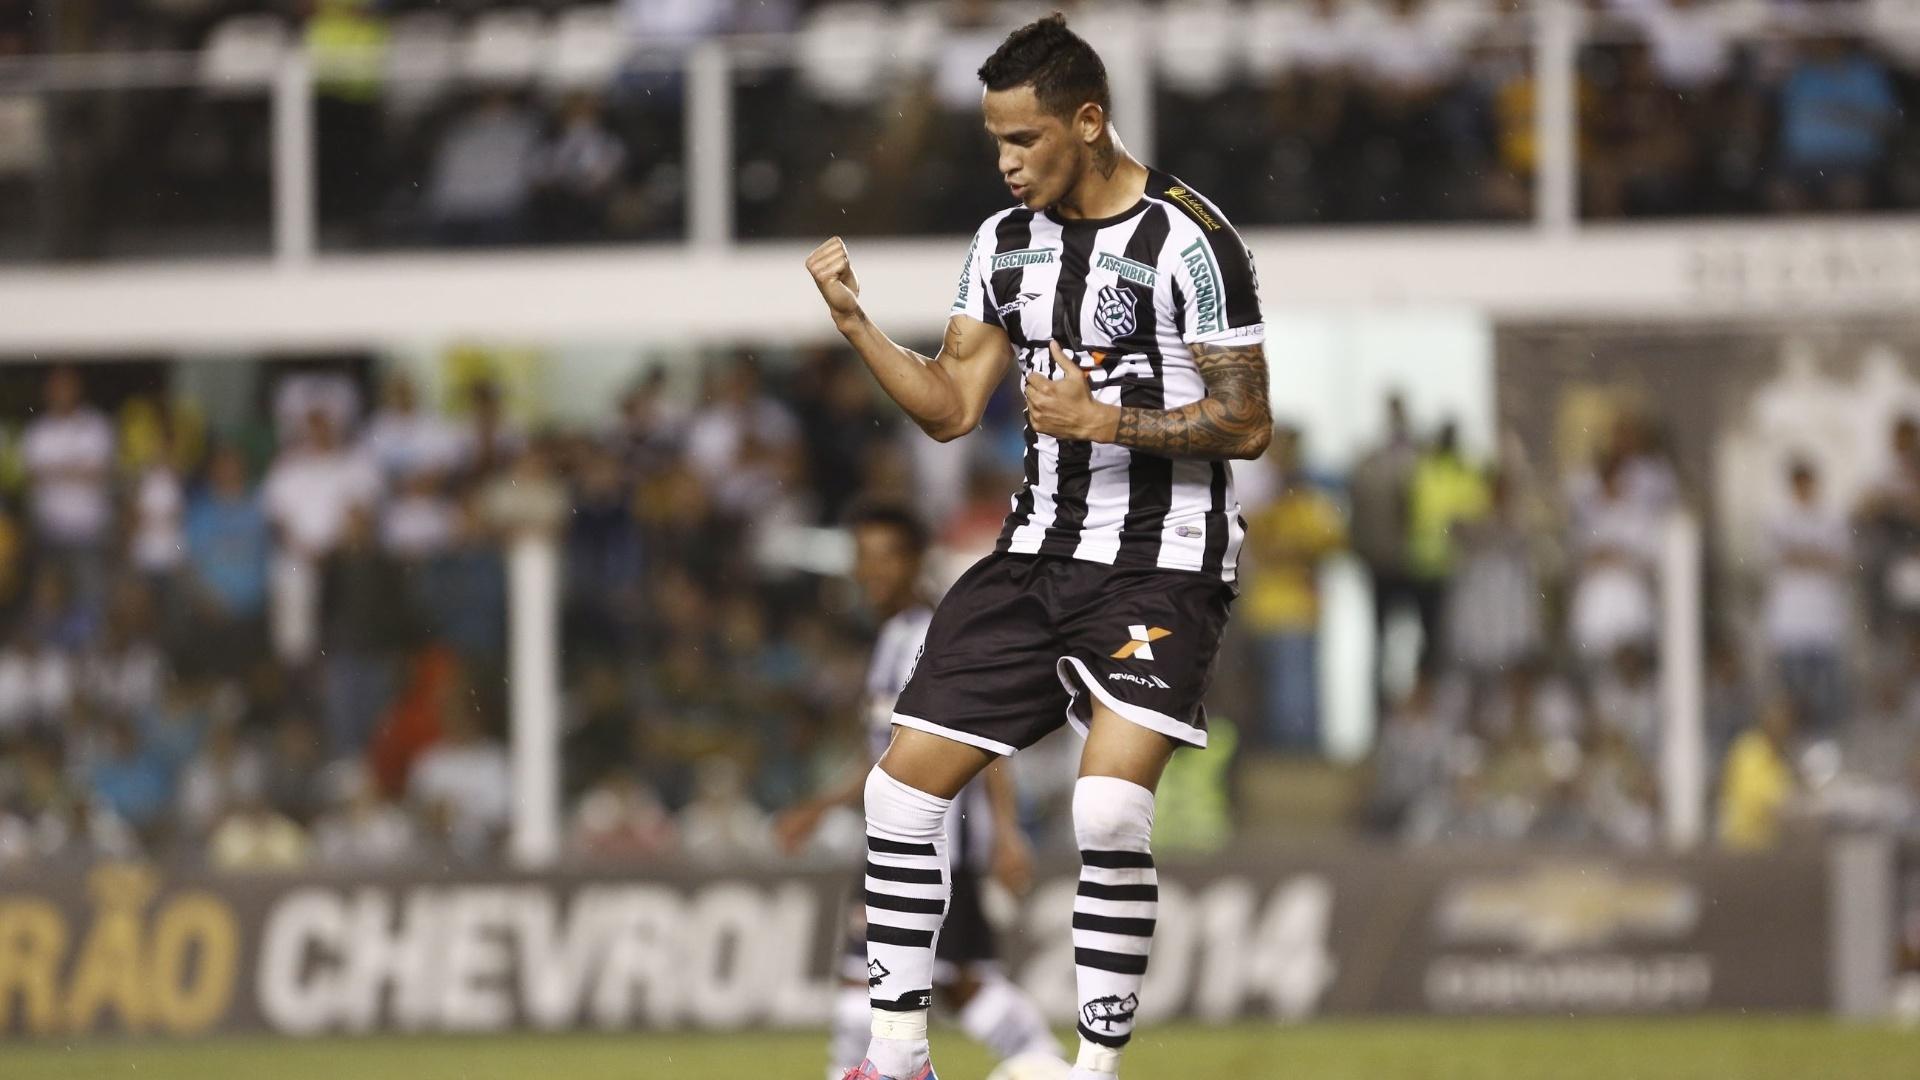 Na derrota do Figueirense por 3 a 1 para o Santos, o gol de honra do time catarinense por marcado por Giovanni Augusto. Ele comemorou bastante o tento